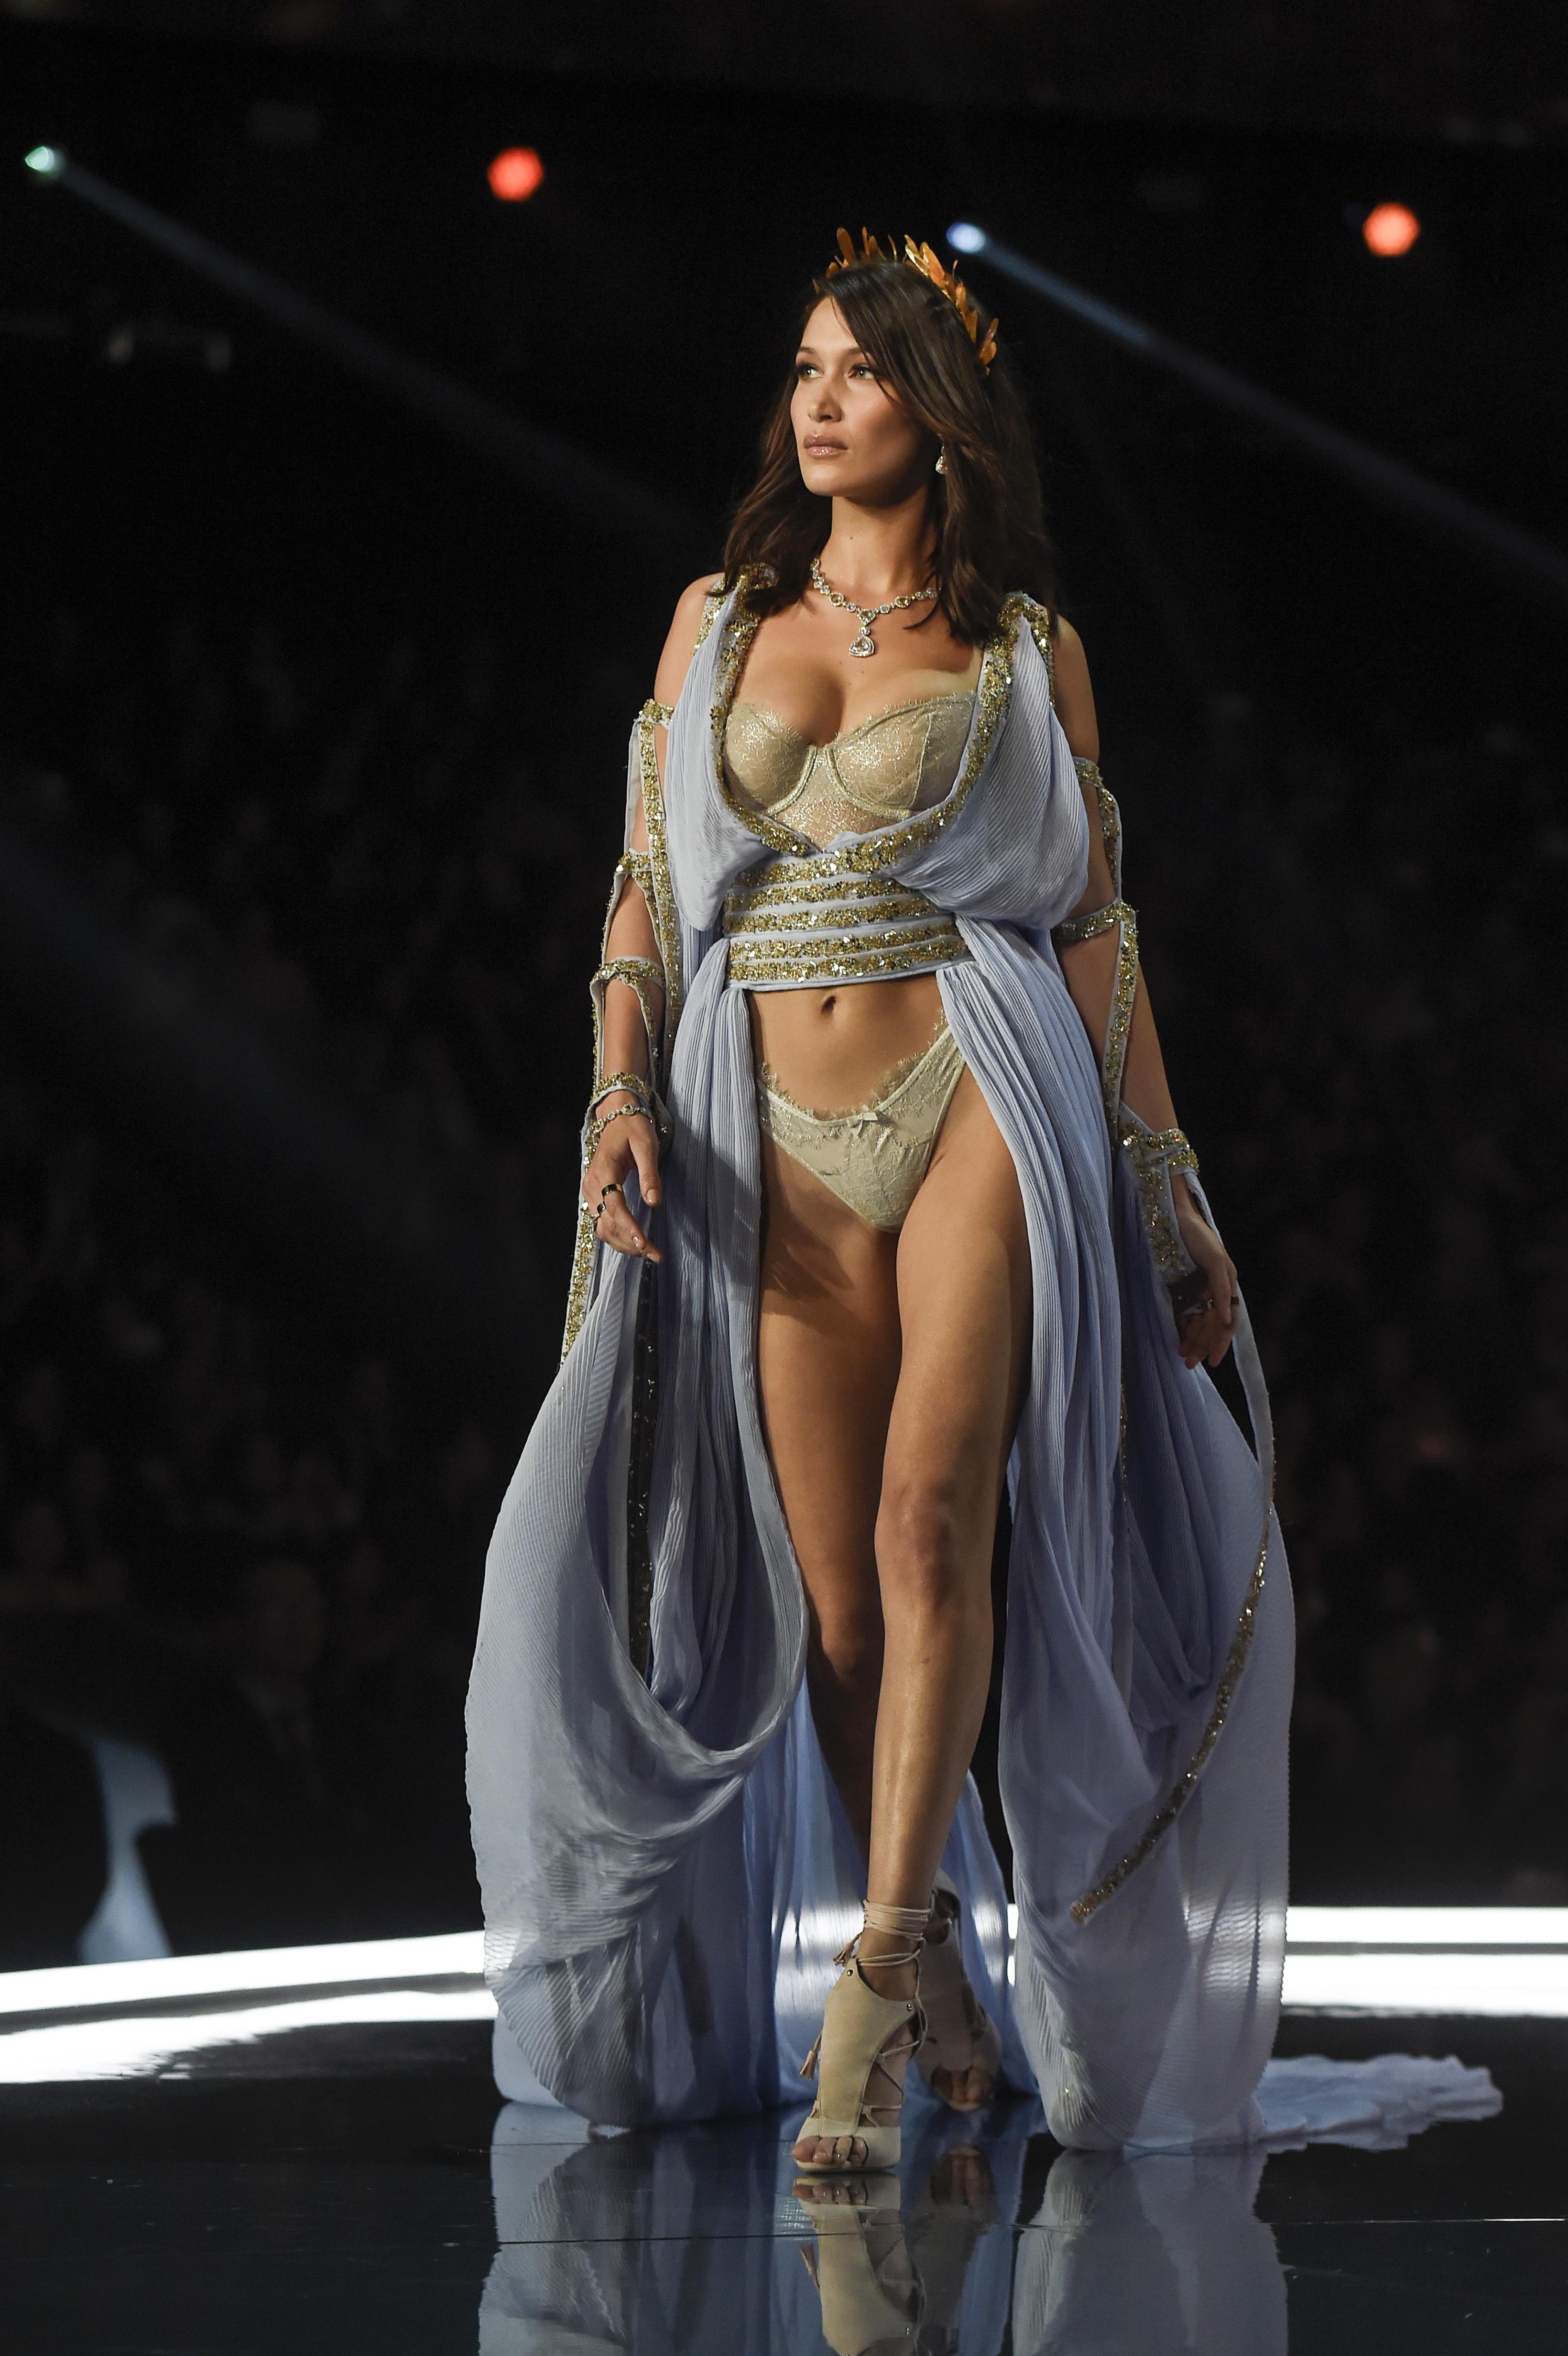 victoria's Secret fashion show, bella hadid, rihanna, savage x fenty, lingerie